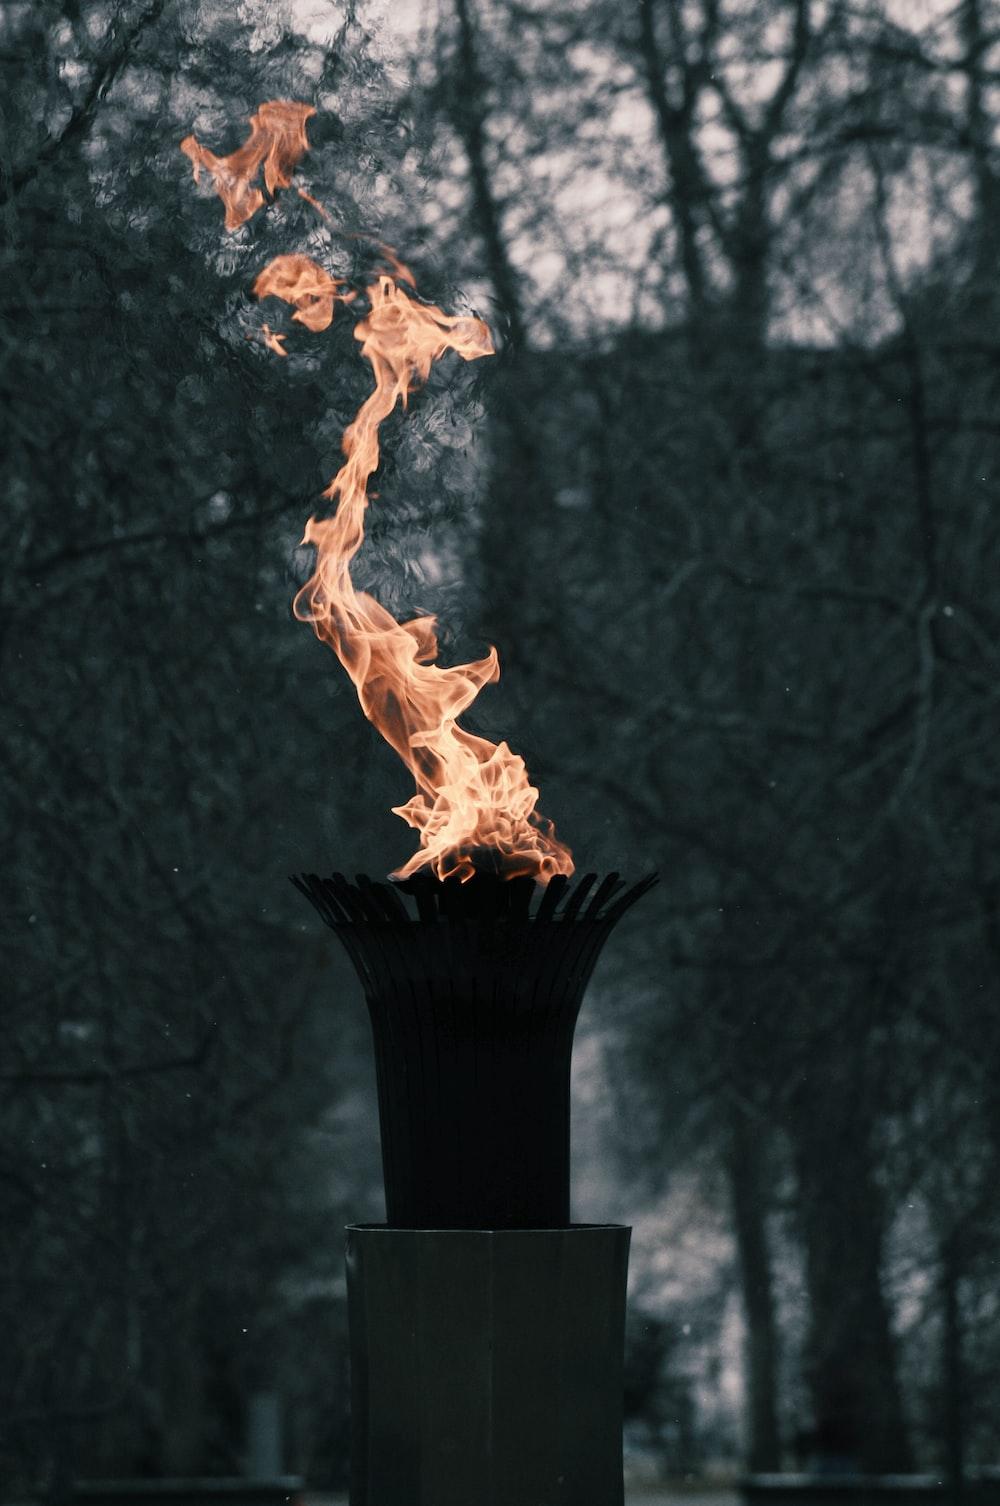 flame near trees